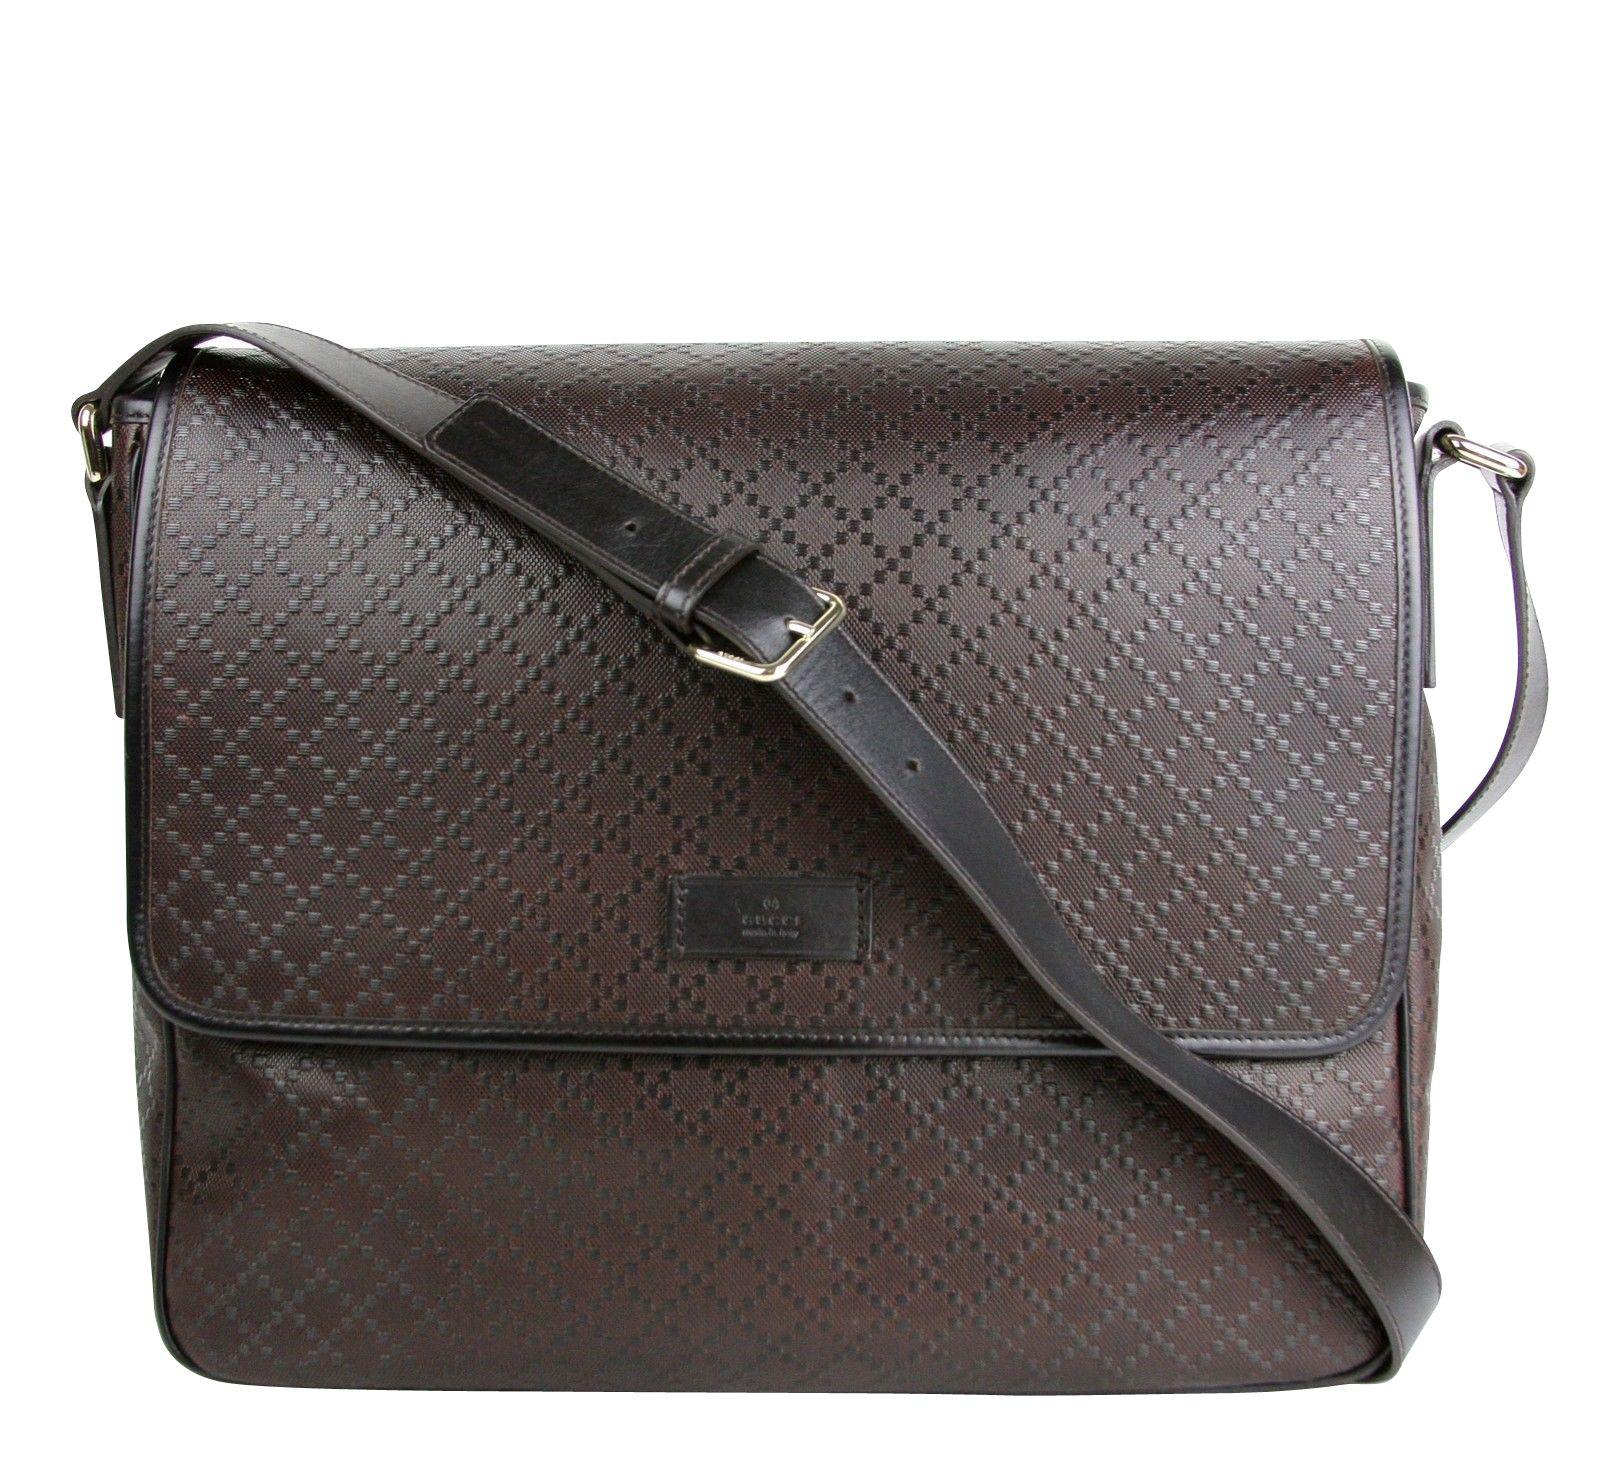 e8470be50ba5 Gucci. Women s Men s Hilary Lux Dark Brown Diamante Leather Messenger Bag  ...